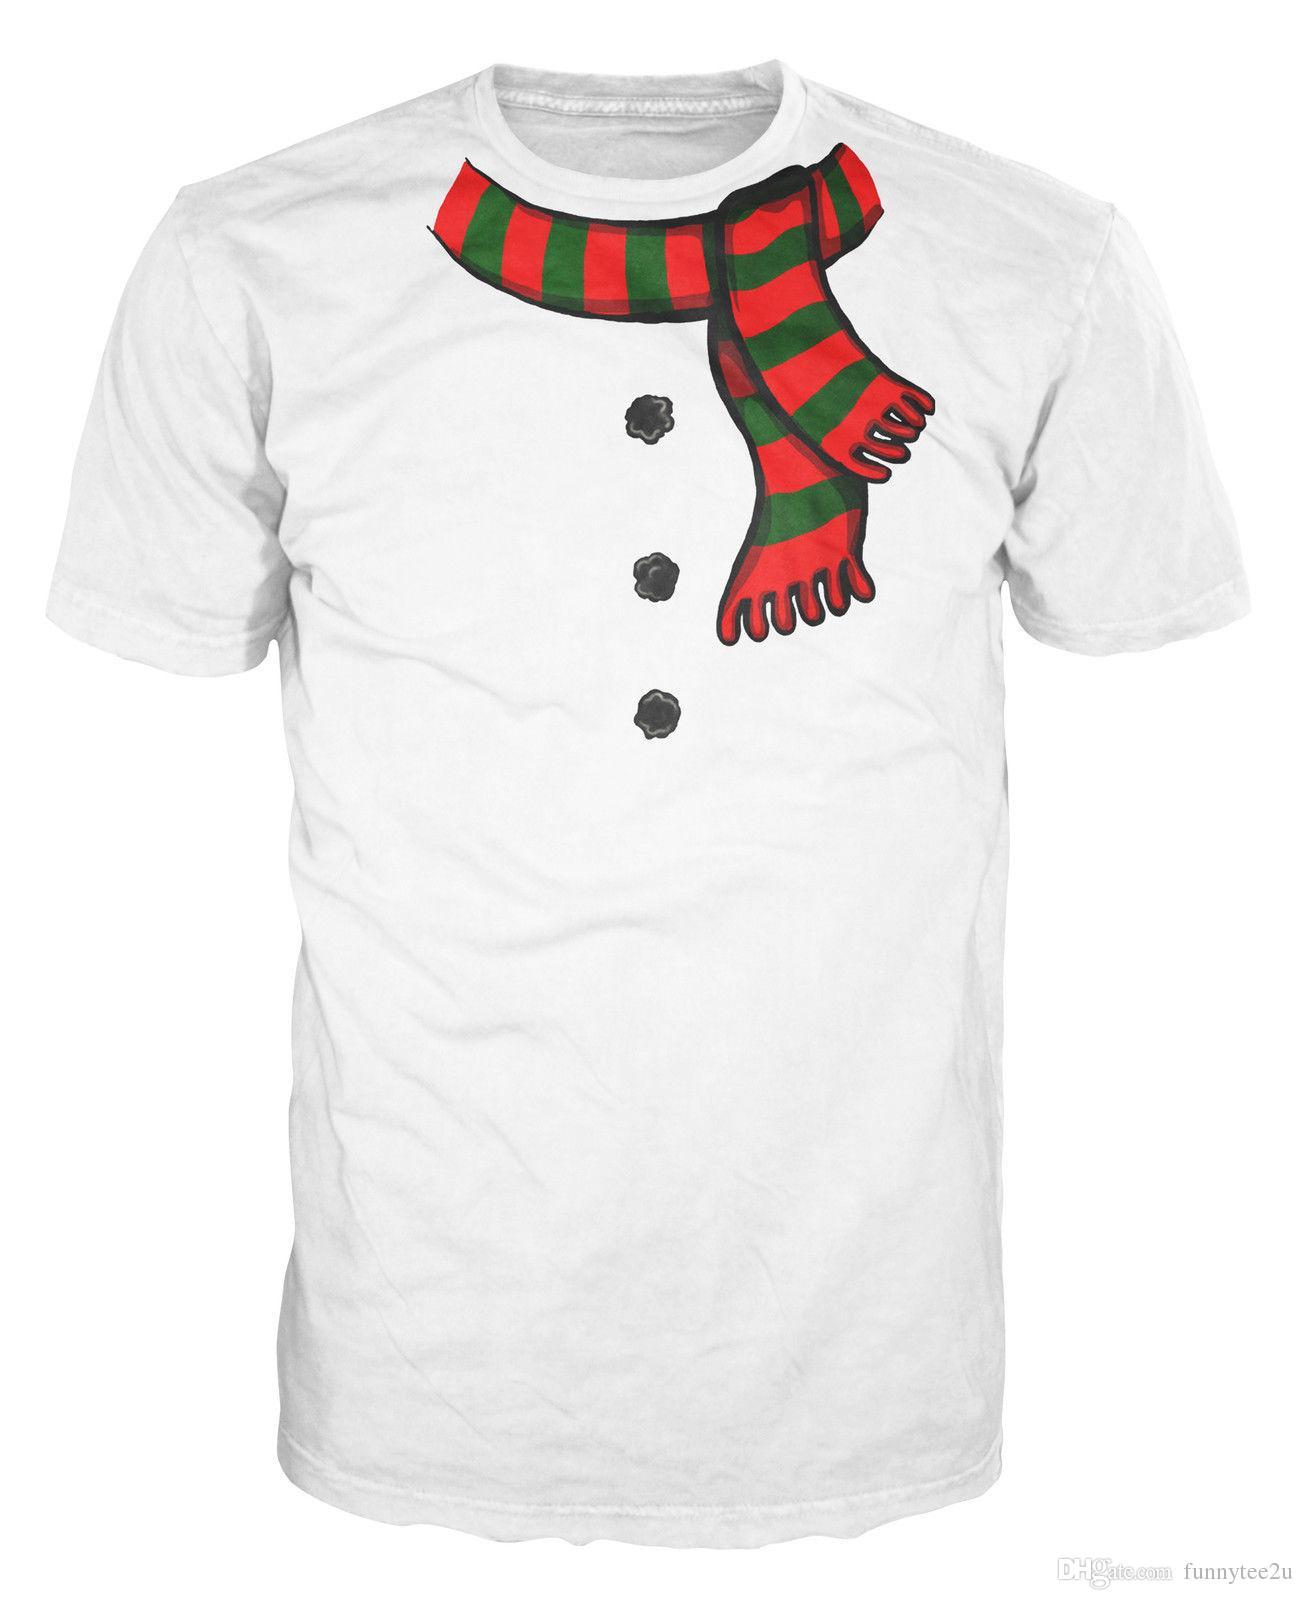 8898341538fb Snowman Costume Funny Christmas Fancy Dress Xmas Fake Scarf Buttons T-Shirt  Tee Shirt Men Popular Custom Short Sleeve Boyfriend's XXXL Party